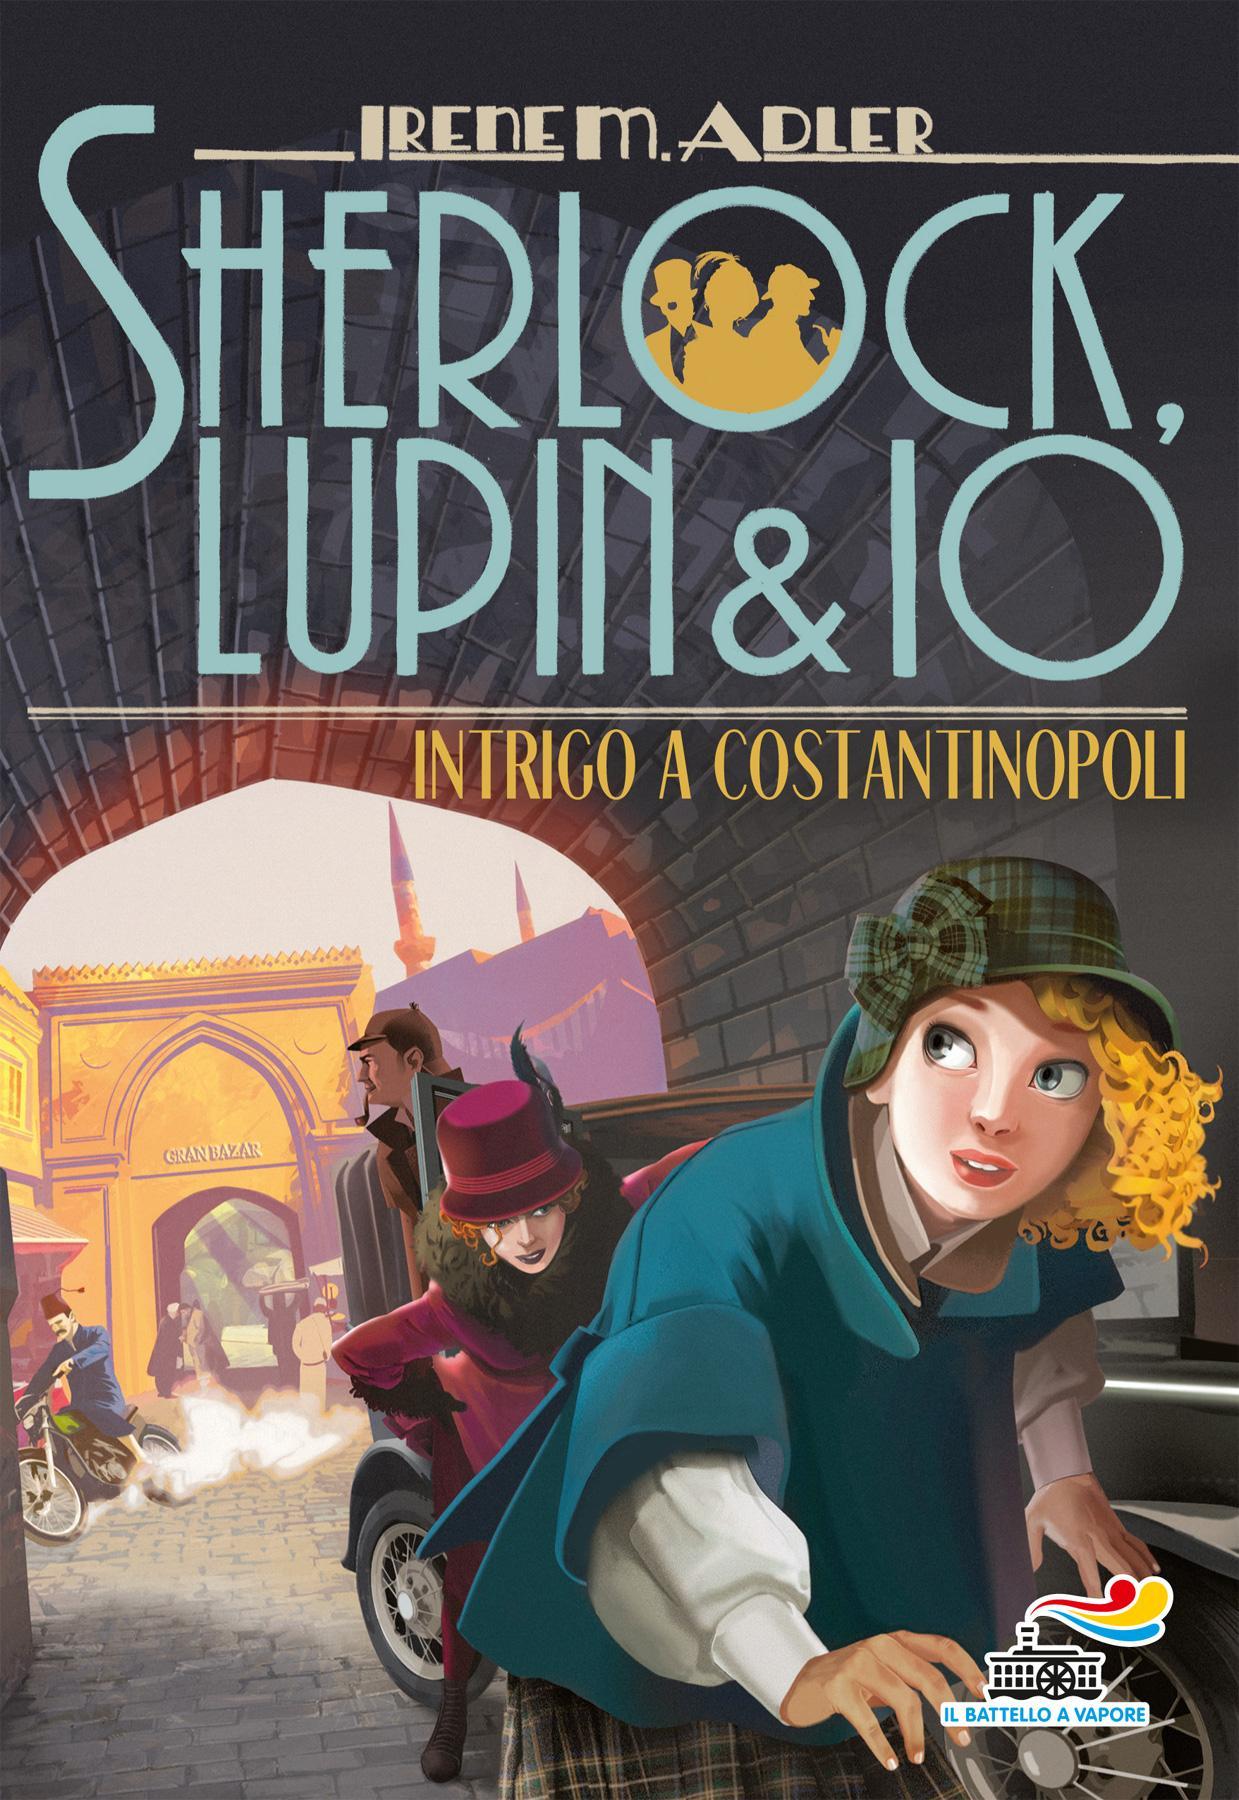 Sherlock, Lupin & Io 20 - Intrigo a Costantinopoli